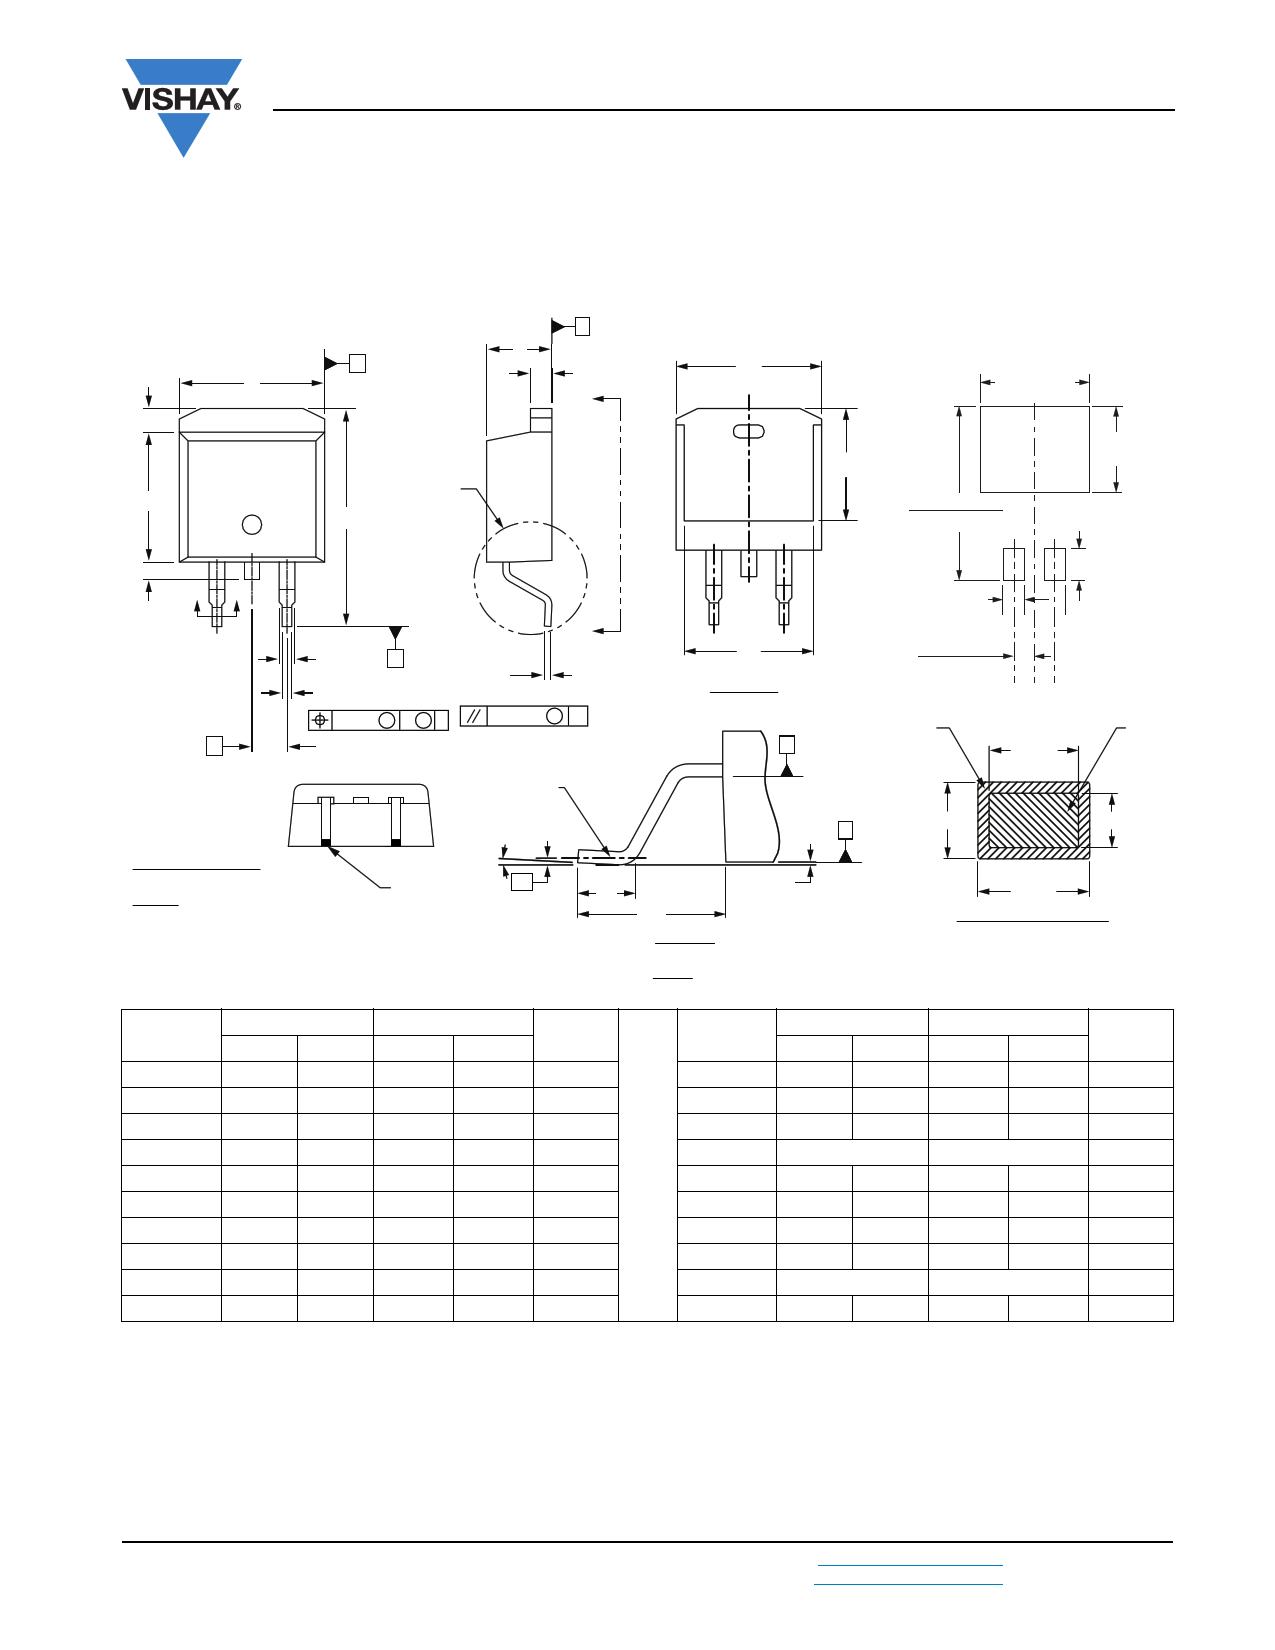 VS-MBR2090CT-1PbF 電子部品, 半導体